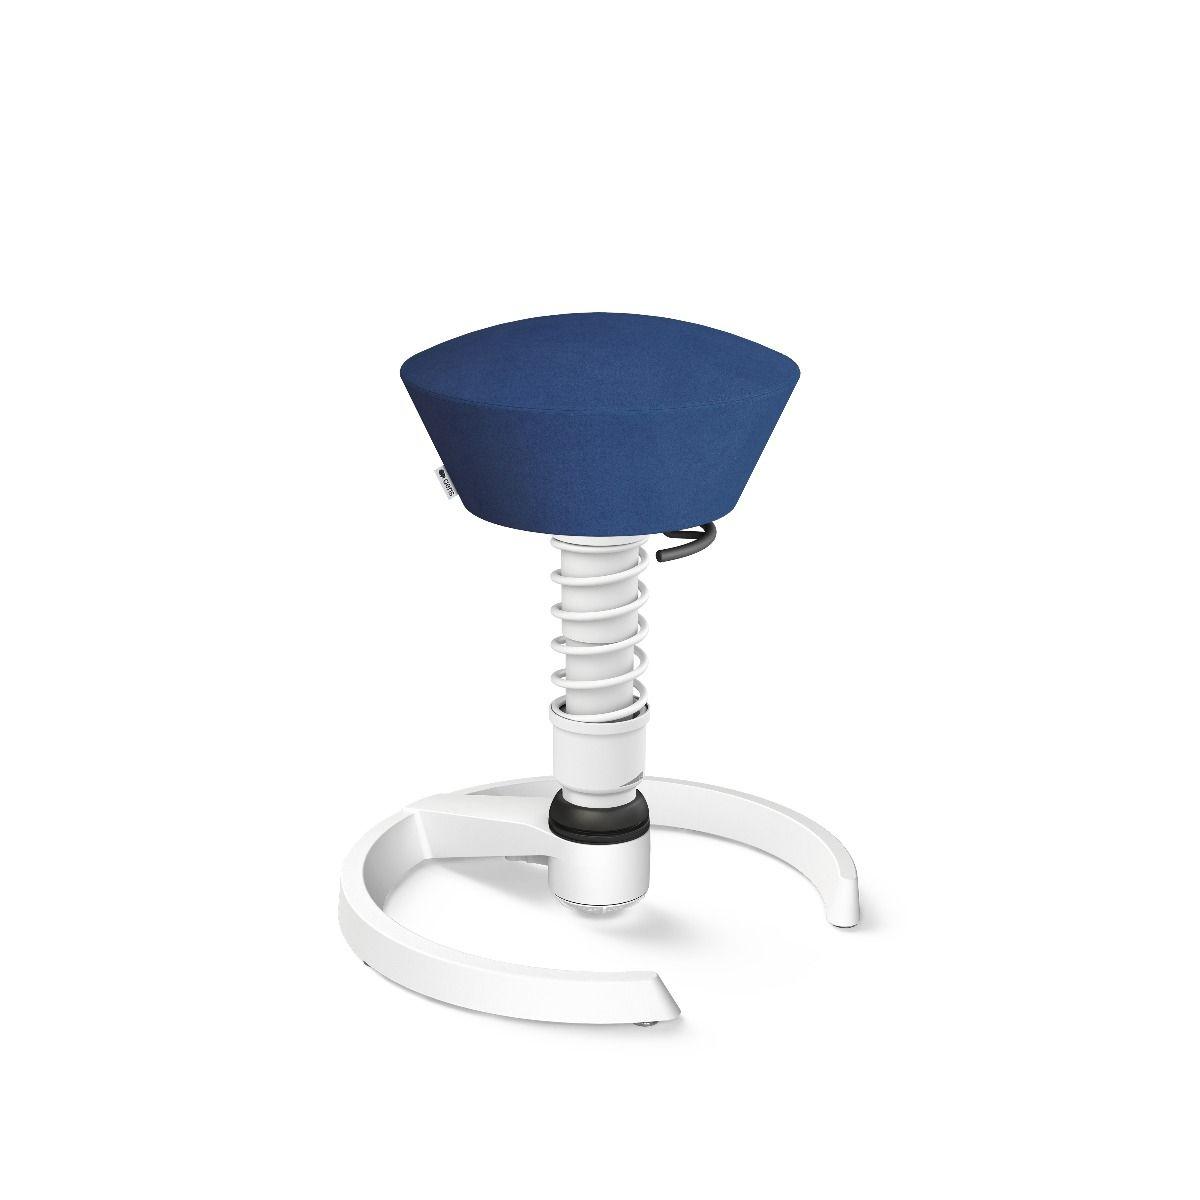 Swopper Classic weiss Mikrofaser (Comfort) blau